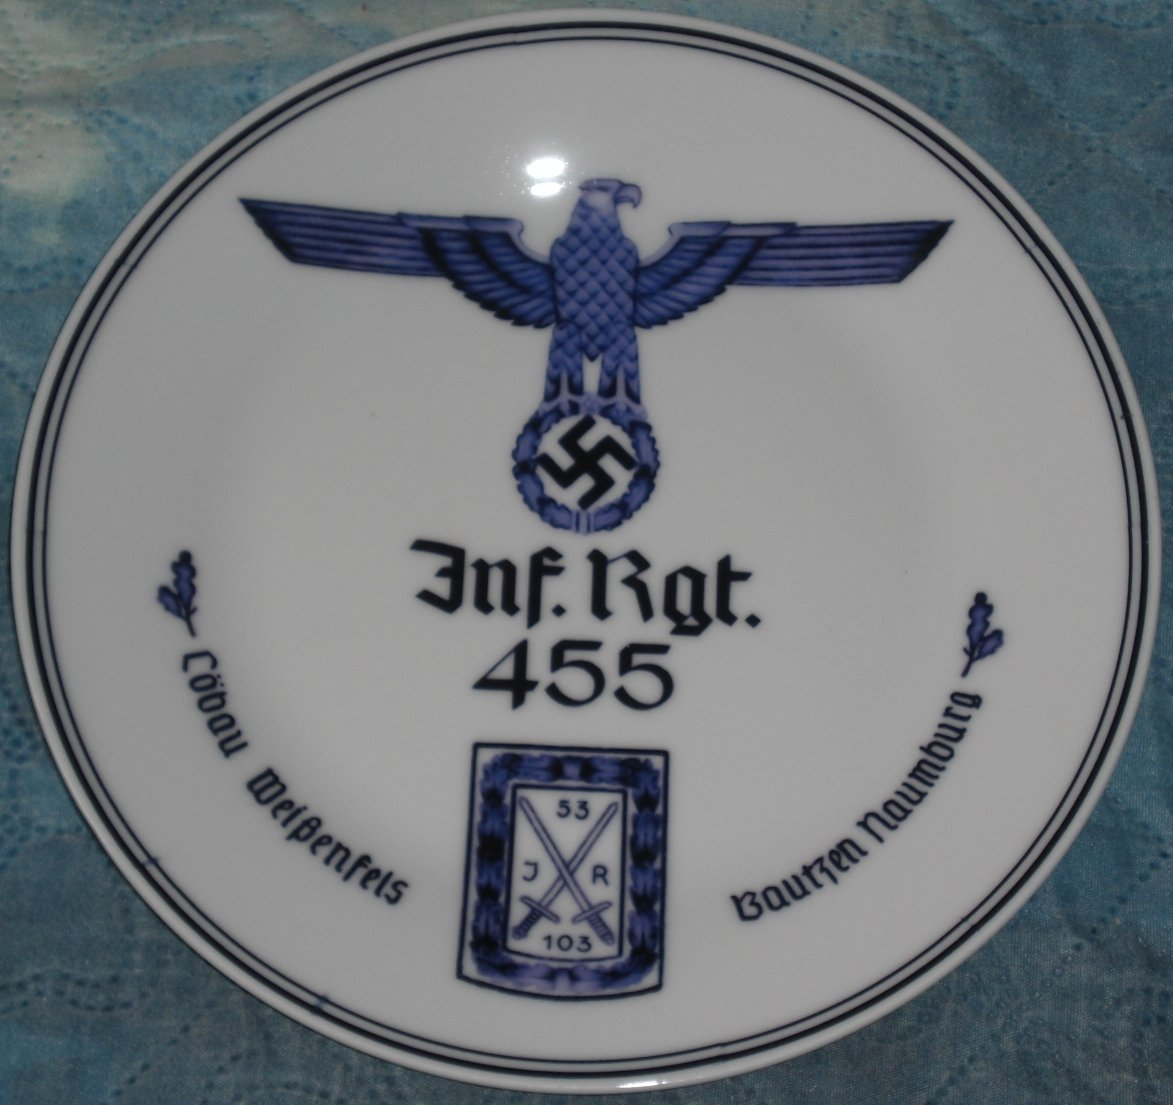 Germany. Porcelain regimental plate with underglaze pattern. Infantry. Brand. Mark.